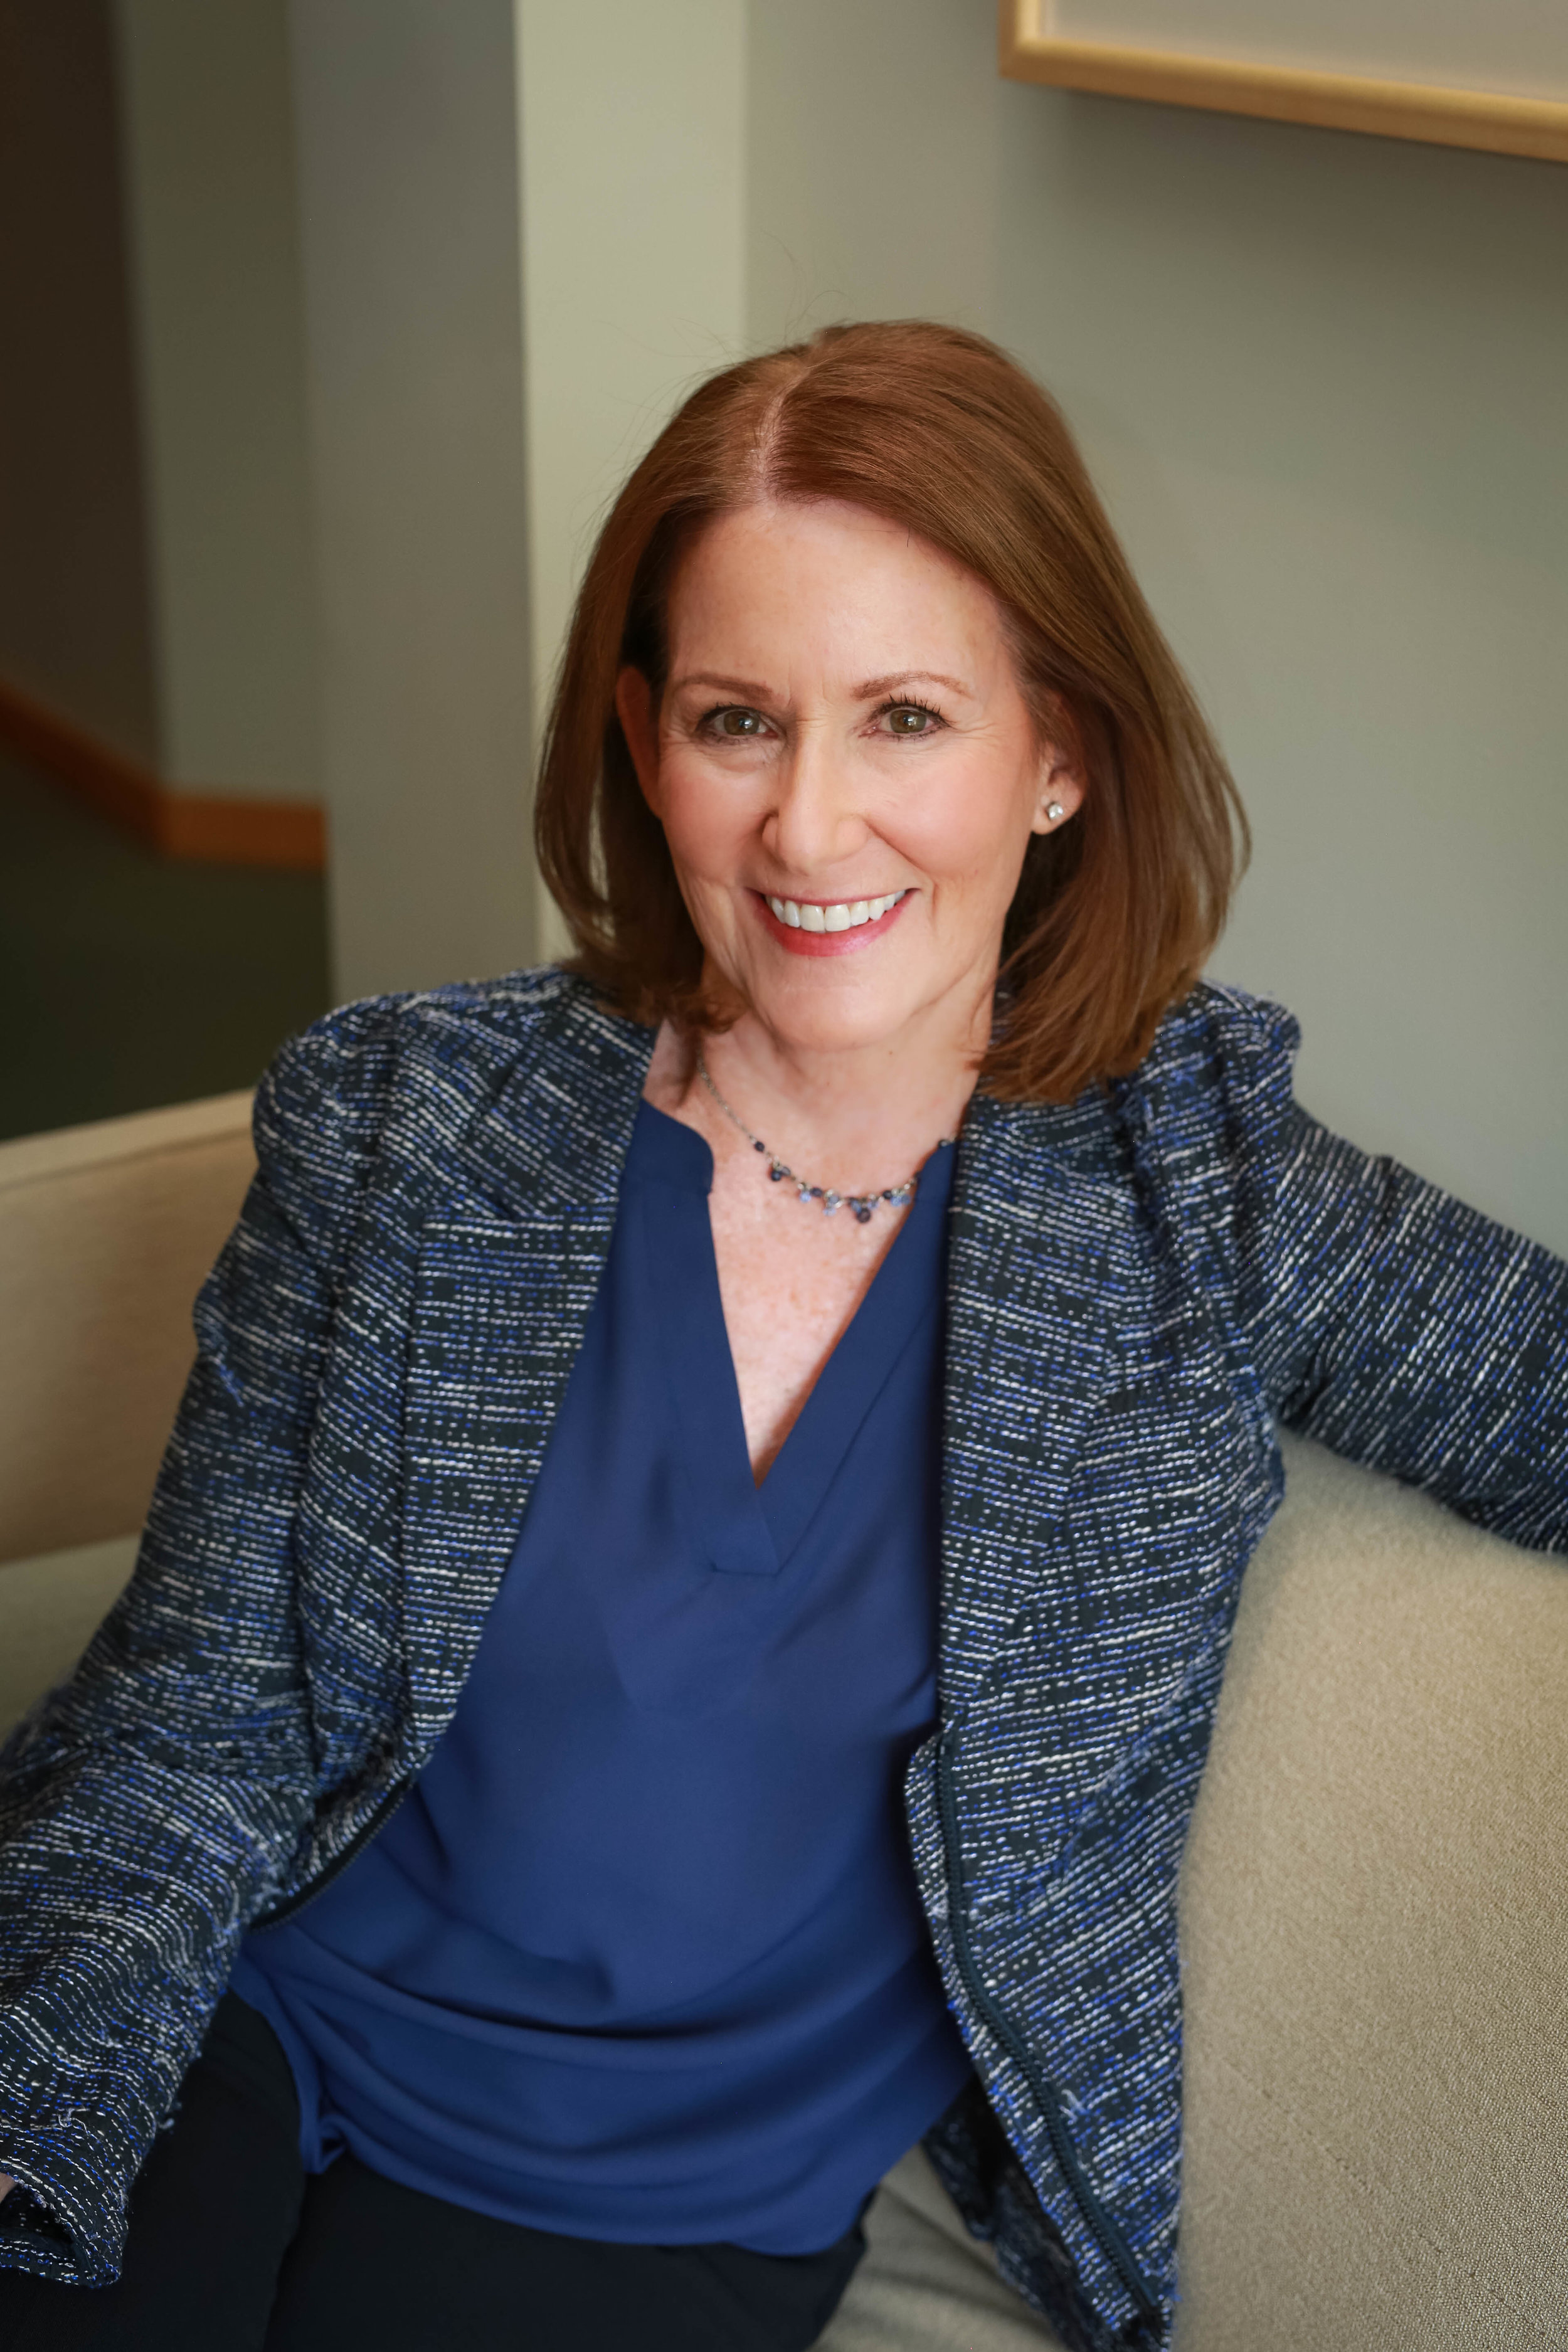 Carla Sledge